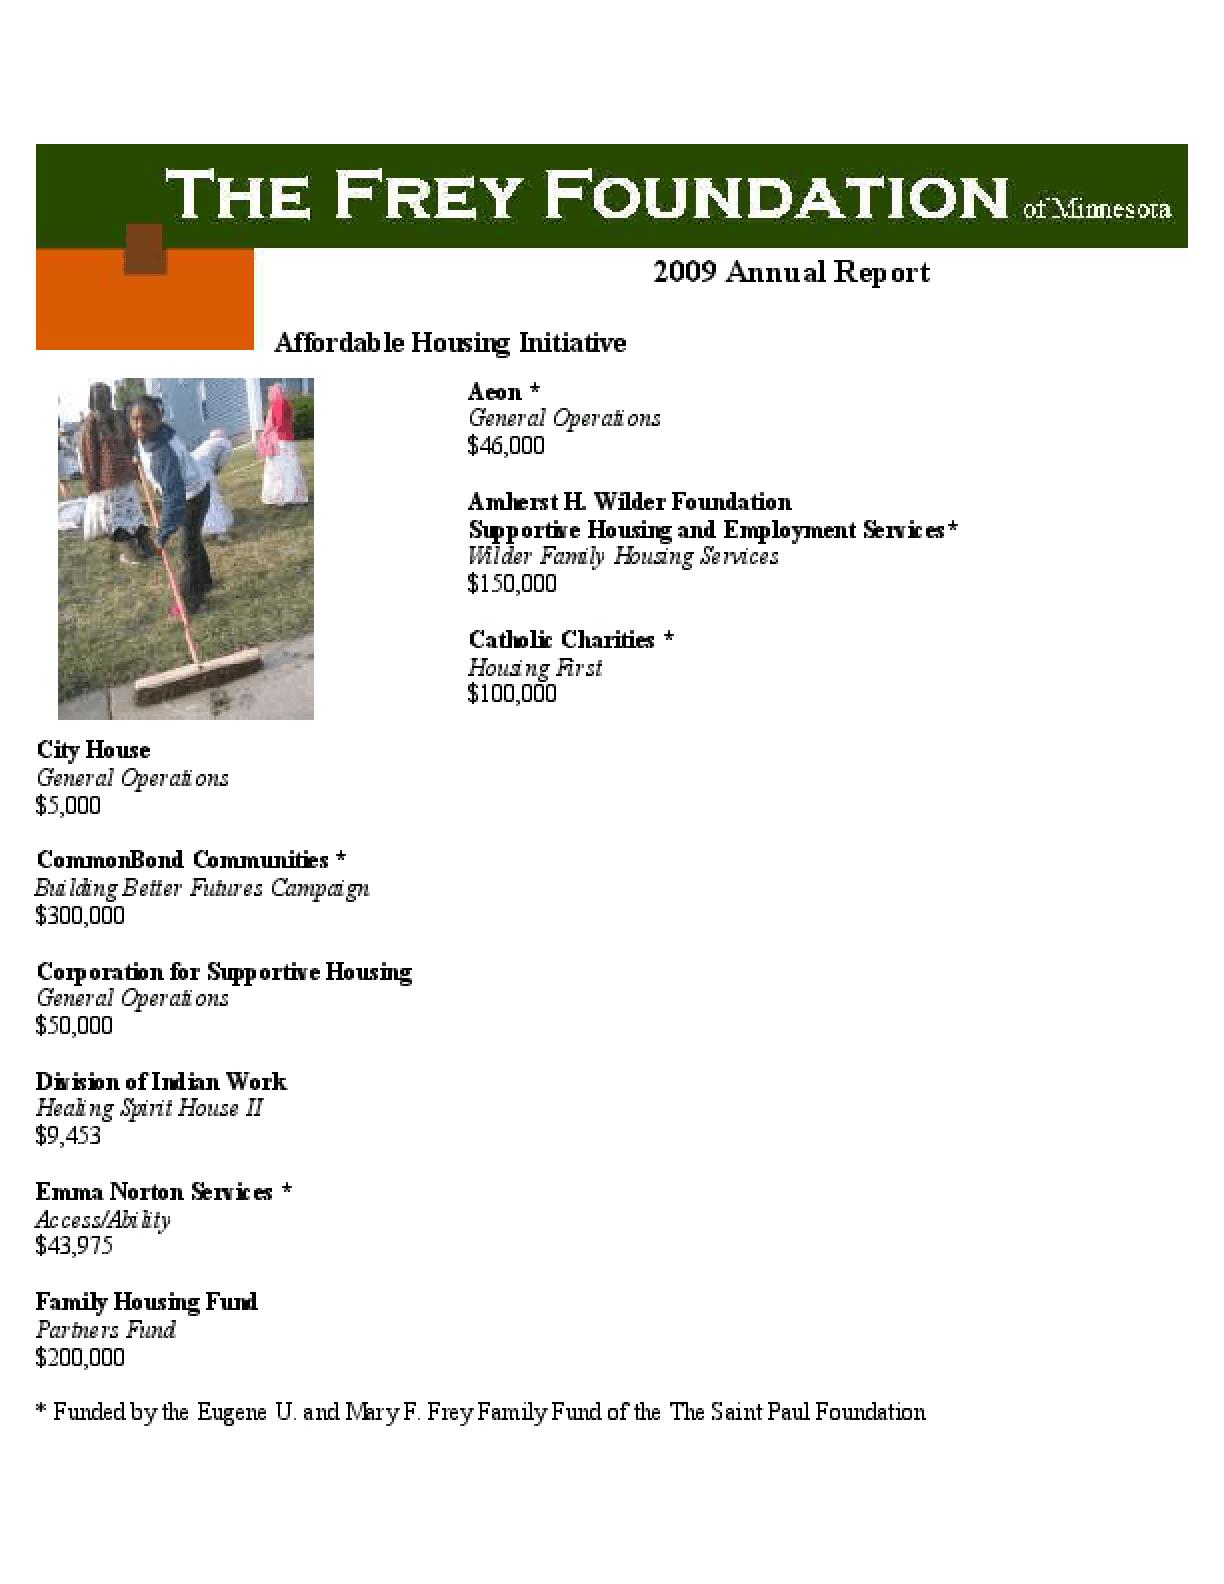 Frey Foundation - 2009 Annual Report